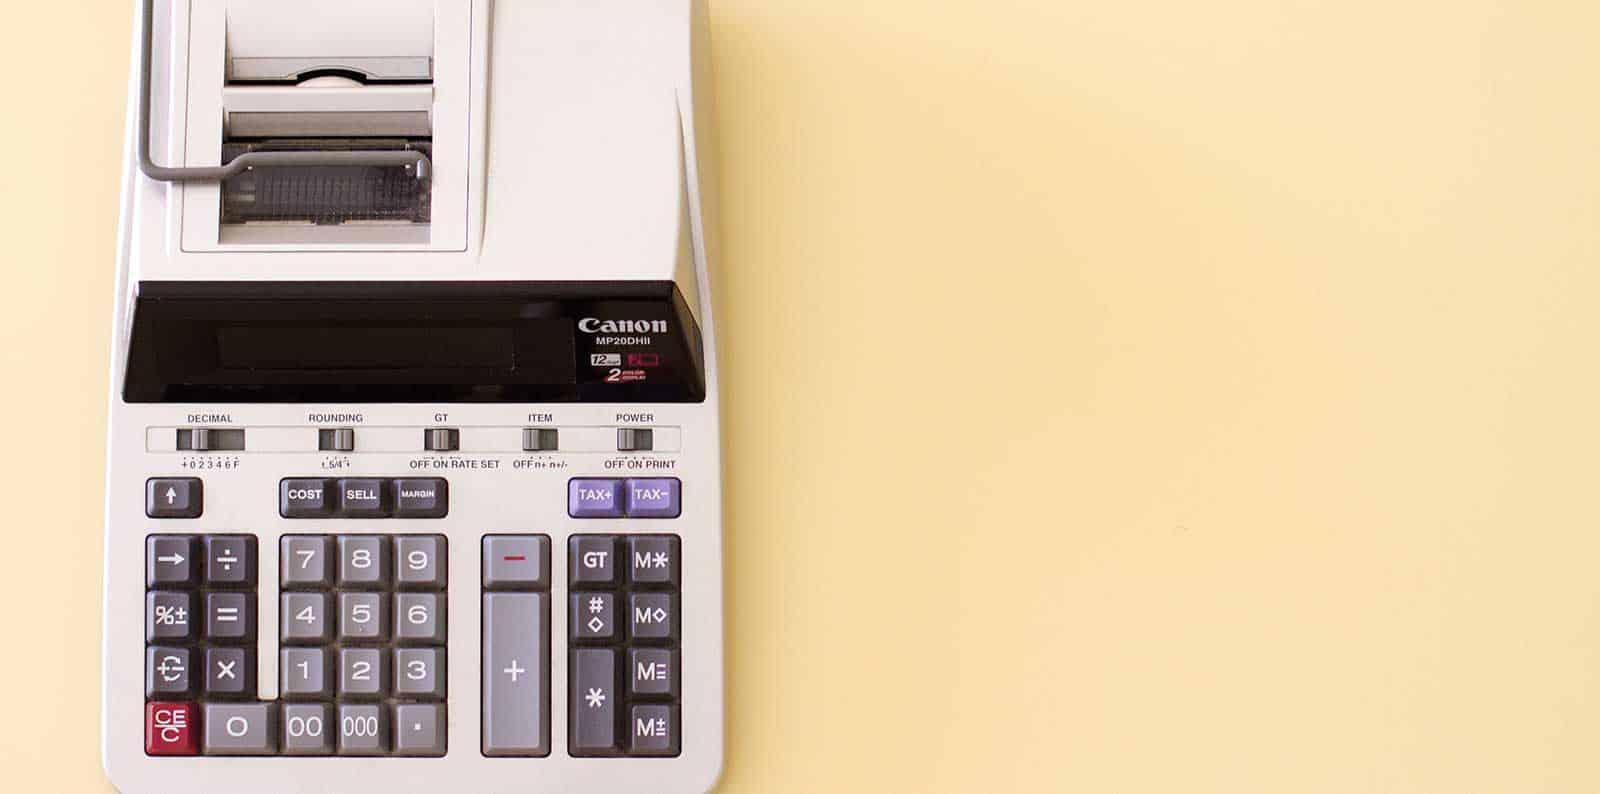 Jobs Where You Work Alone - Bookkeeping